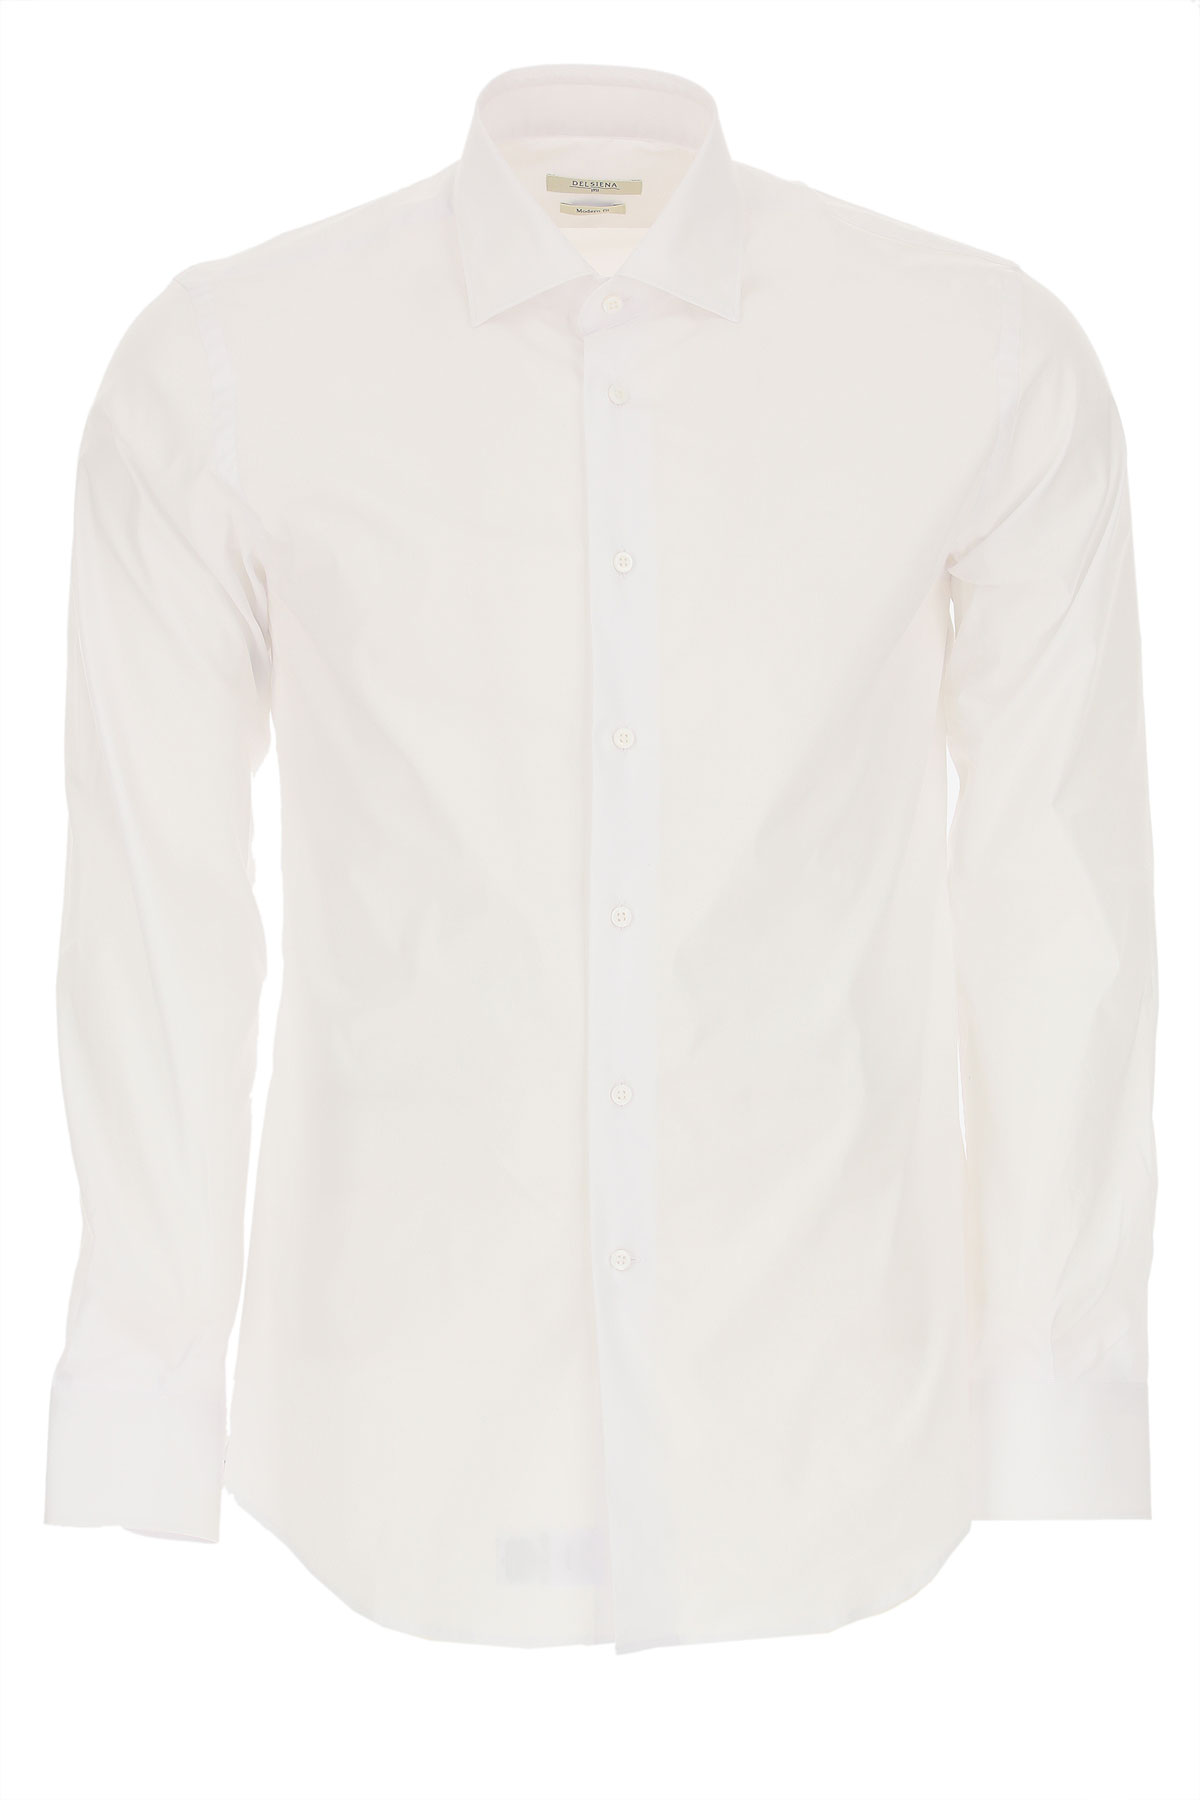 Del Siena Shirt for Men On Sale, White, Cotton, 2019, 15.75 16 17 17.5